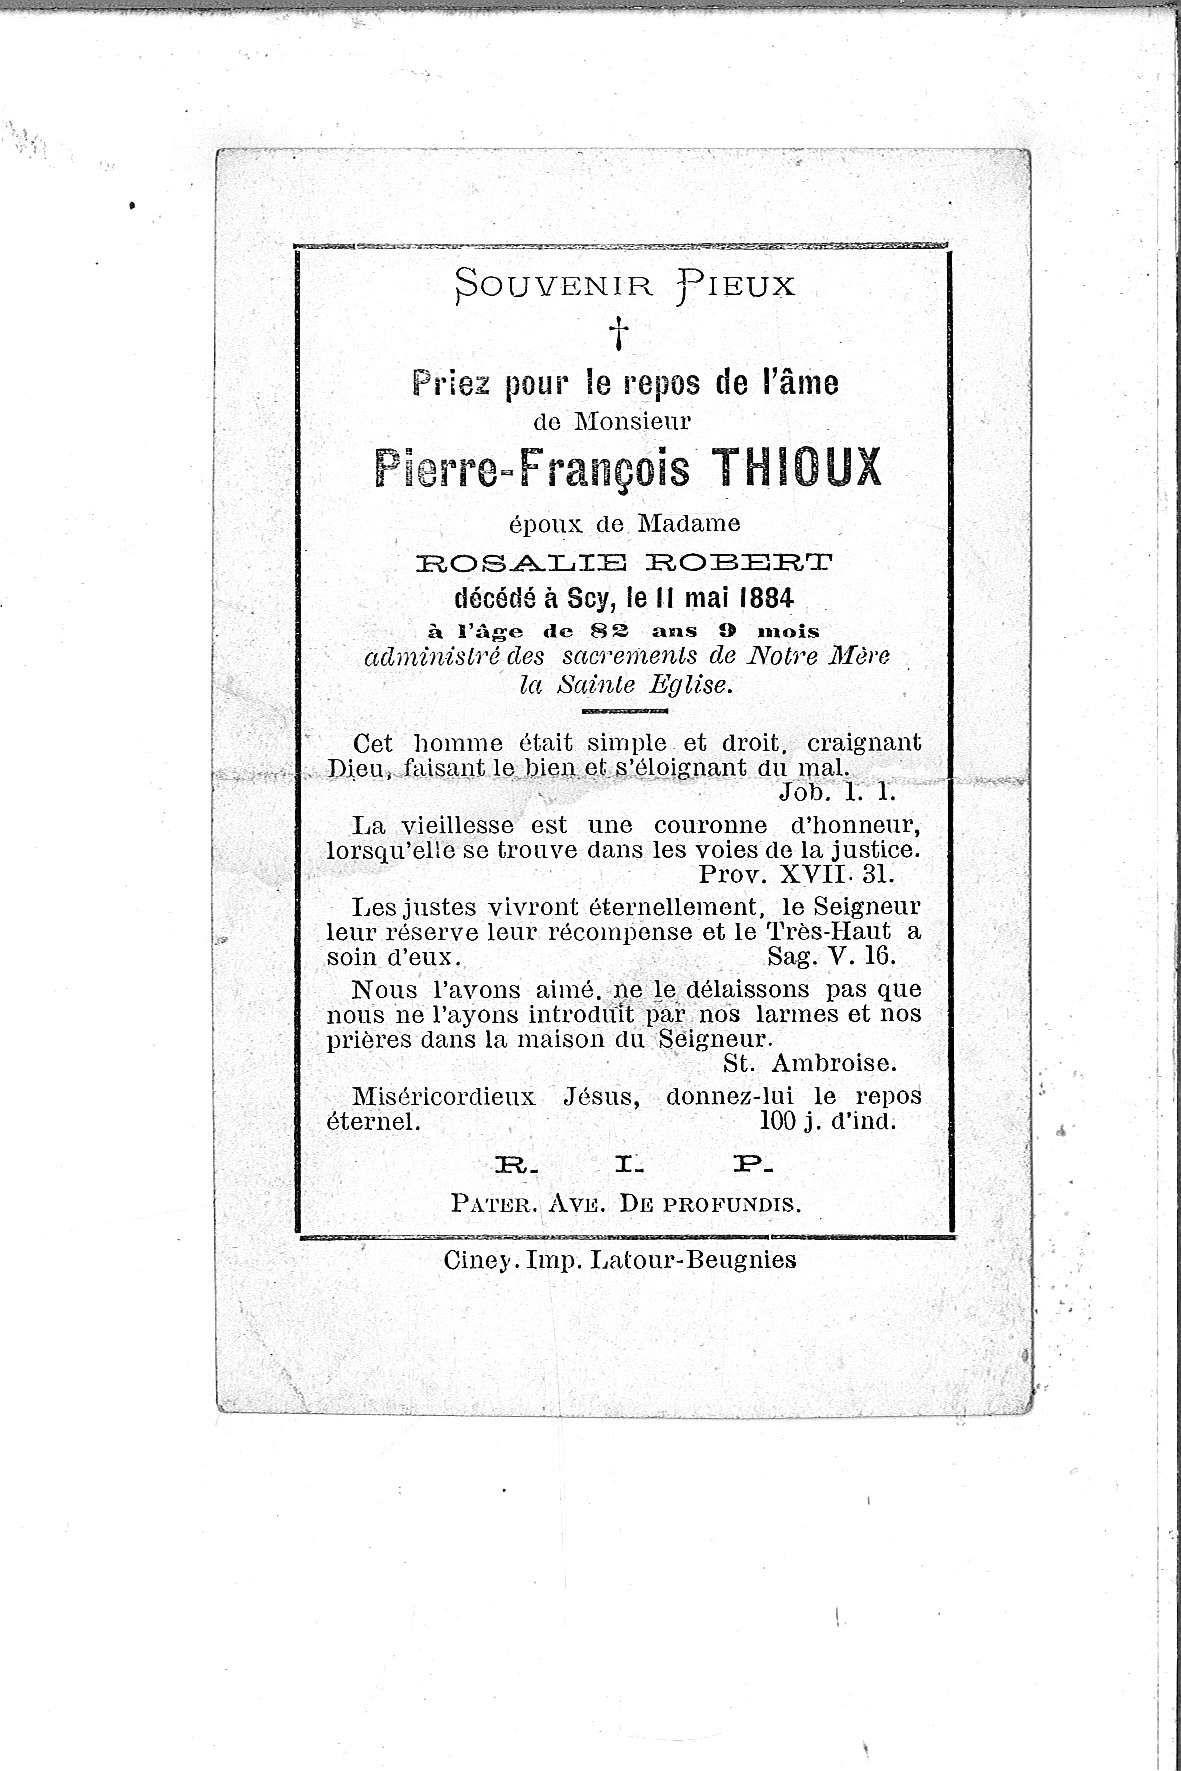 Pierre-François(1884)20140825083222_00151.jpg